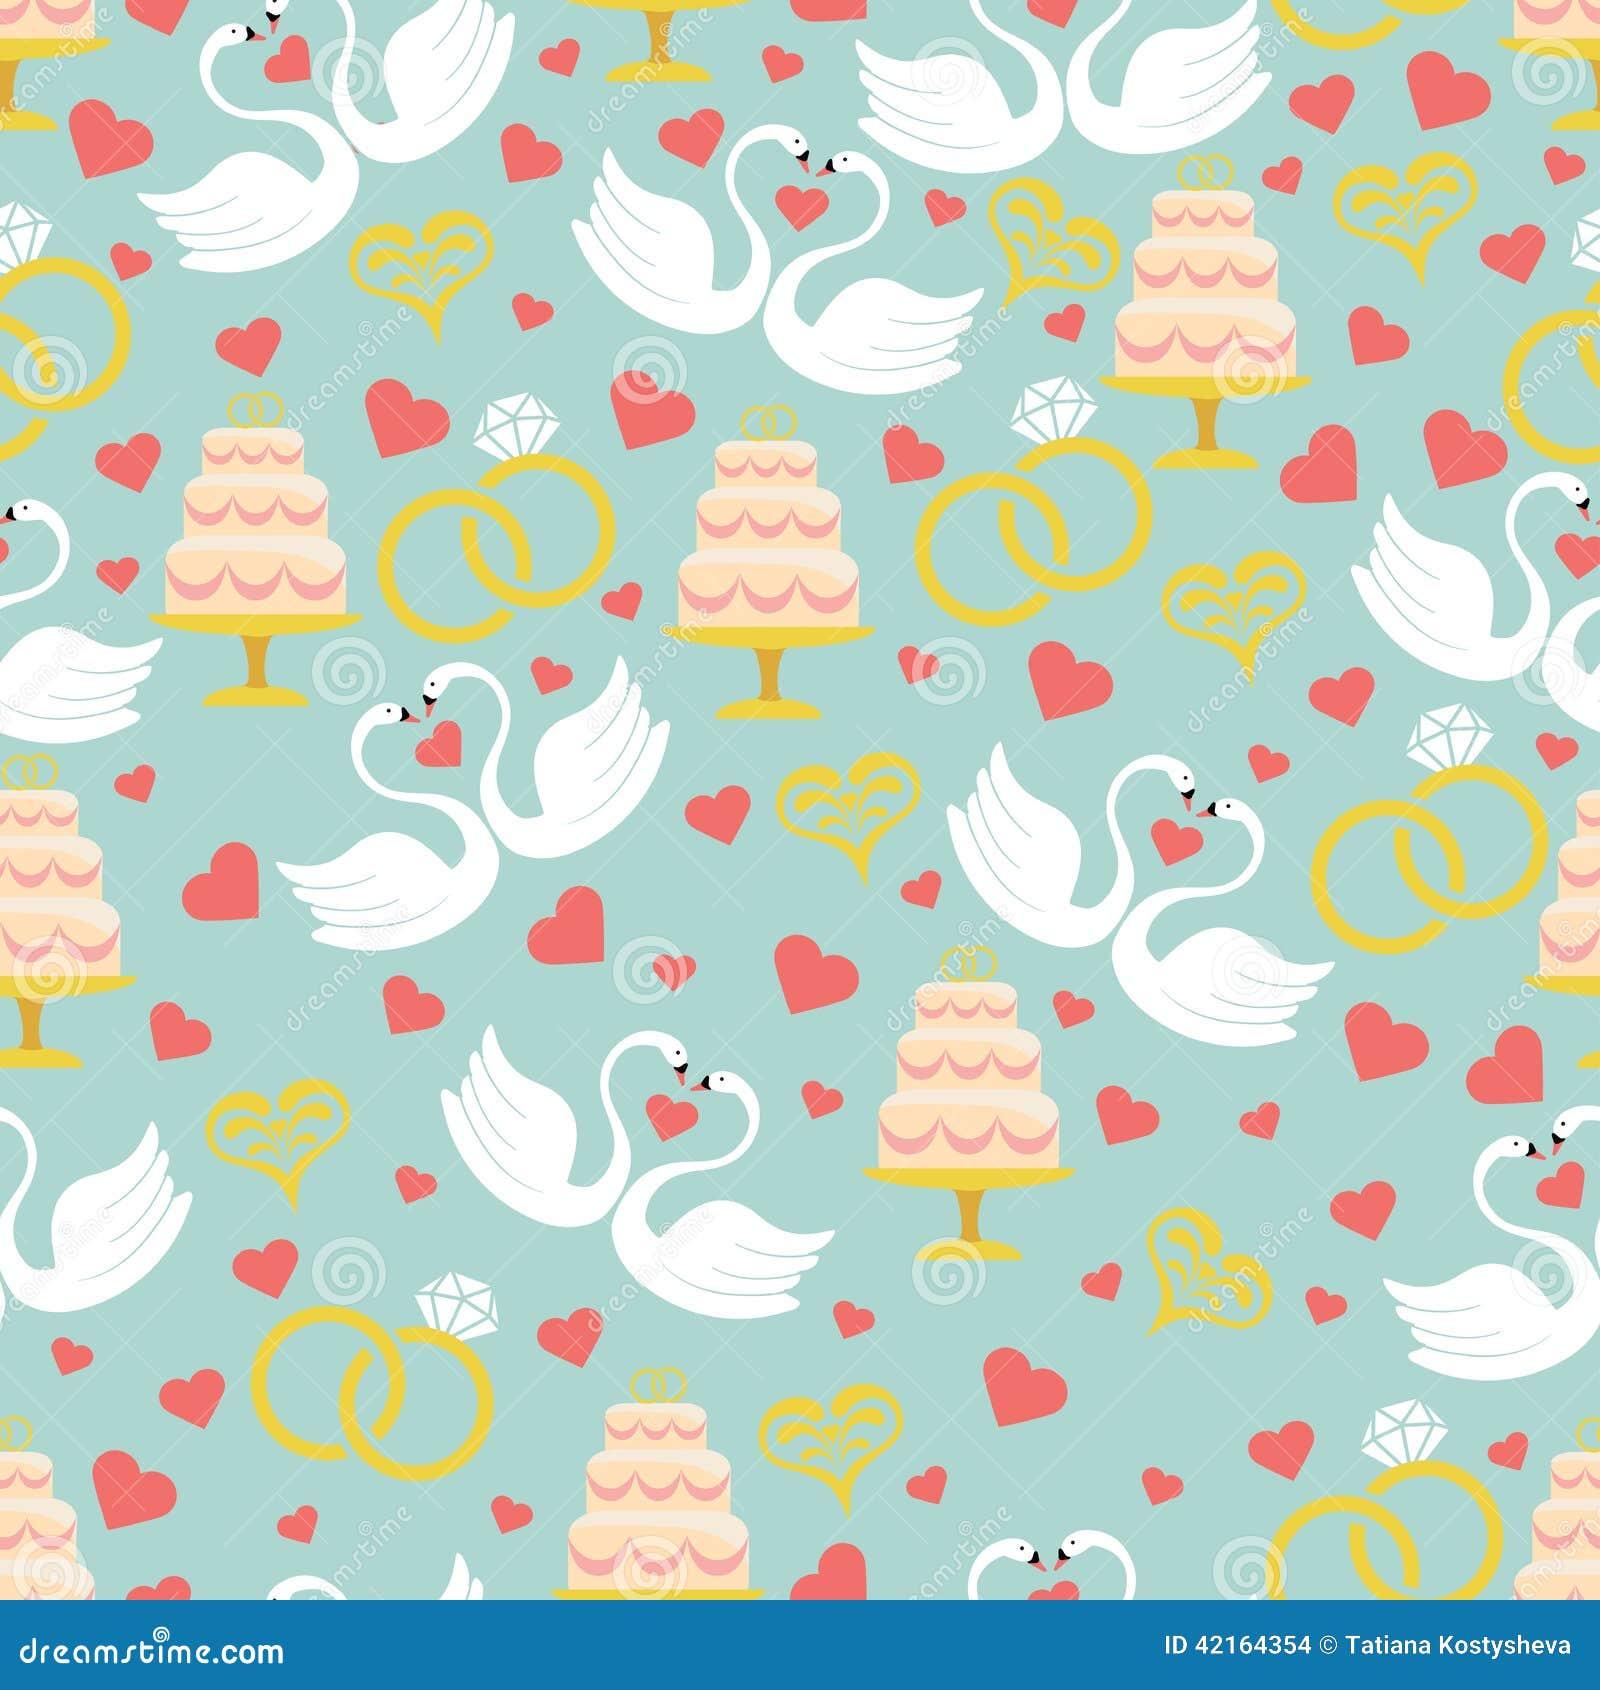 Retro style kitchen wallpaper - Buingoctan